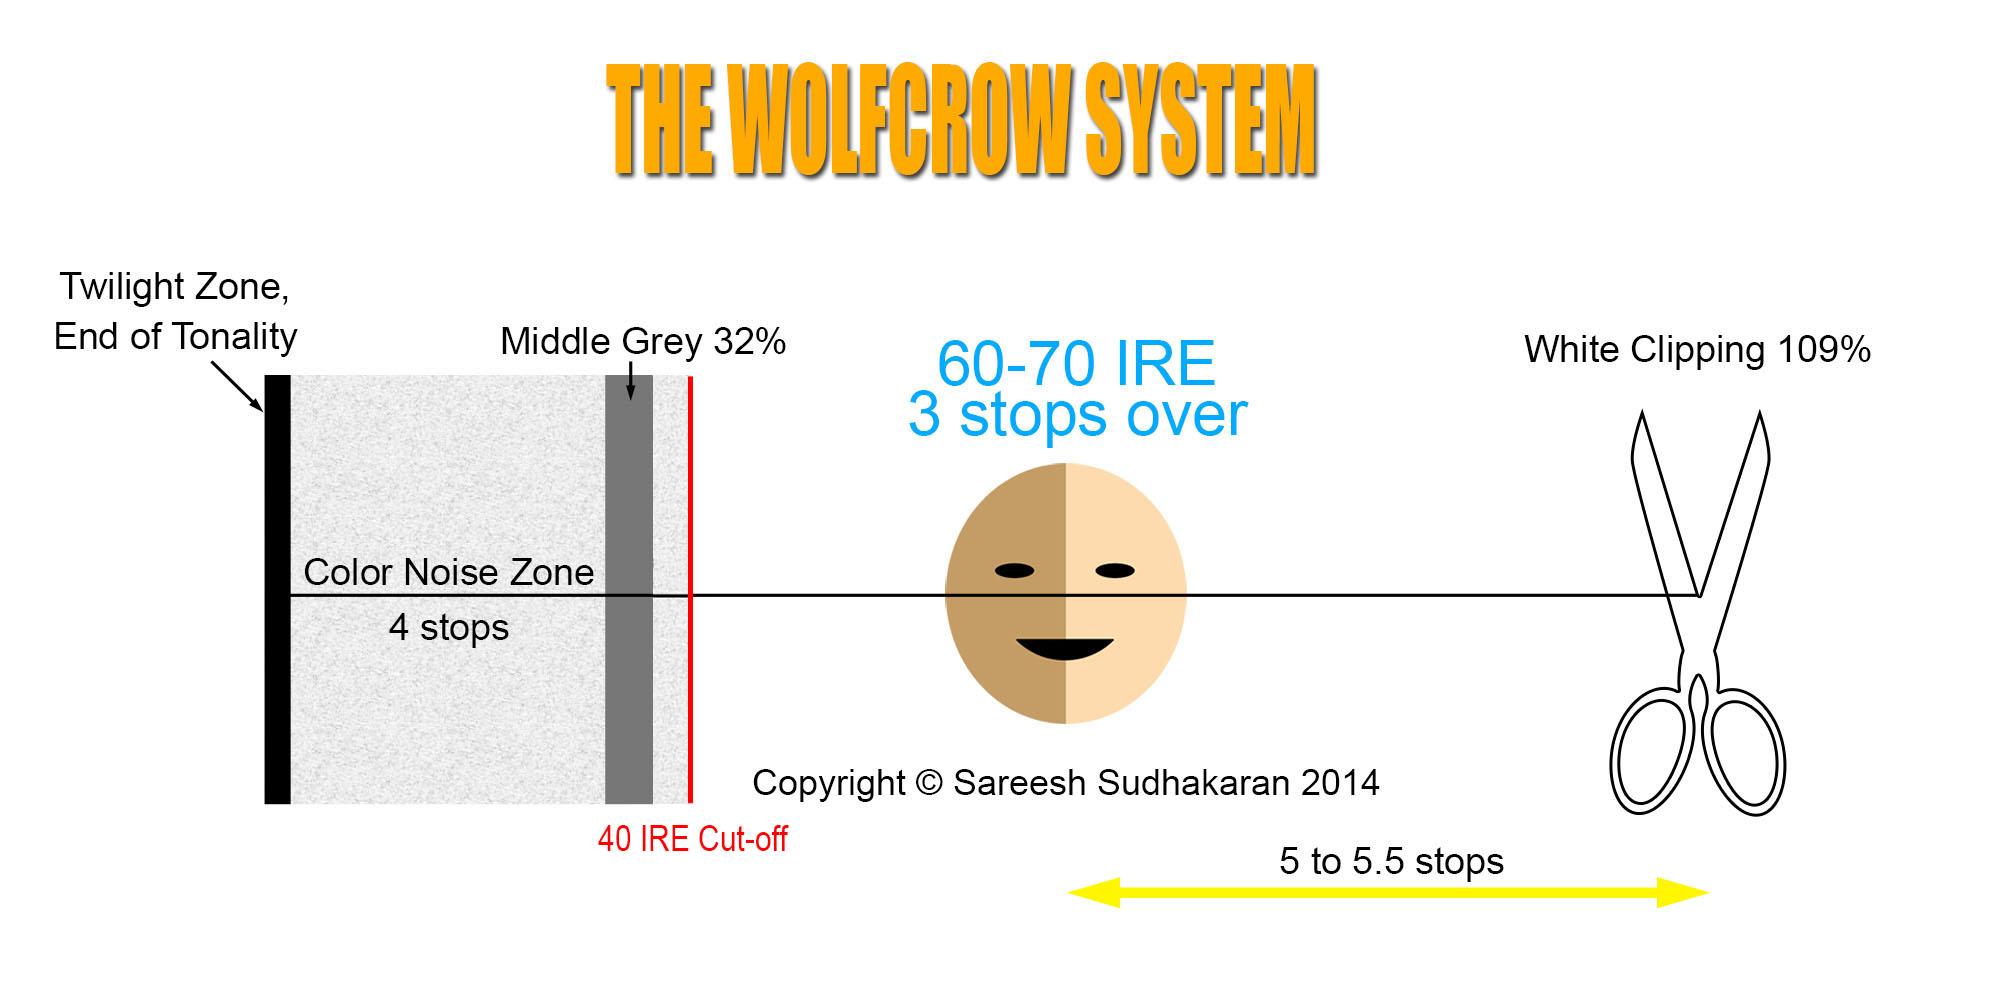 WolfcrowSystemofSLog2